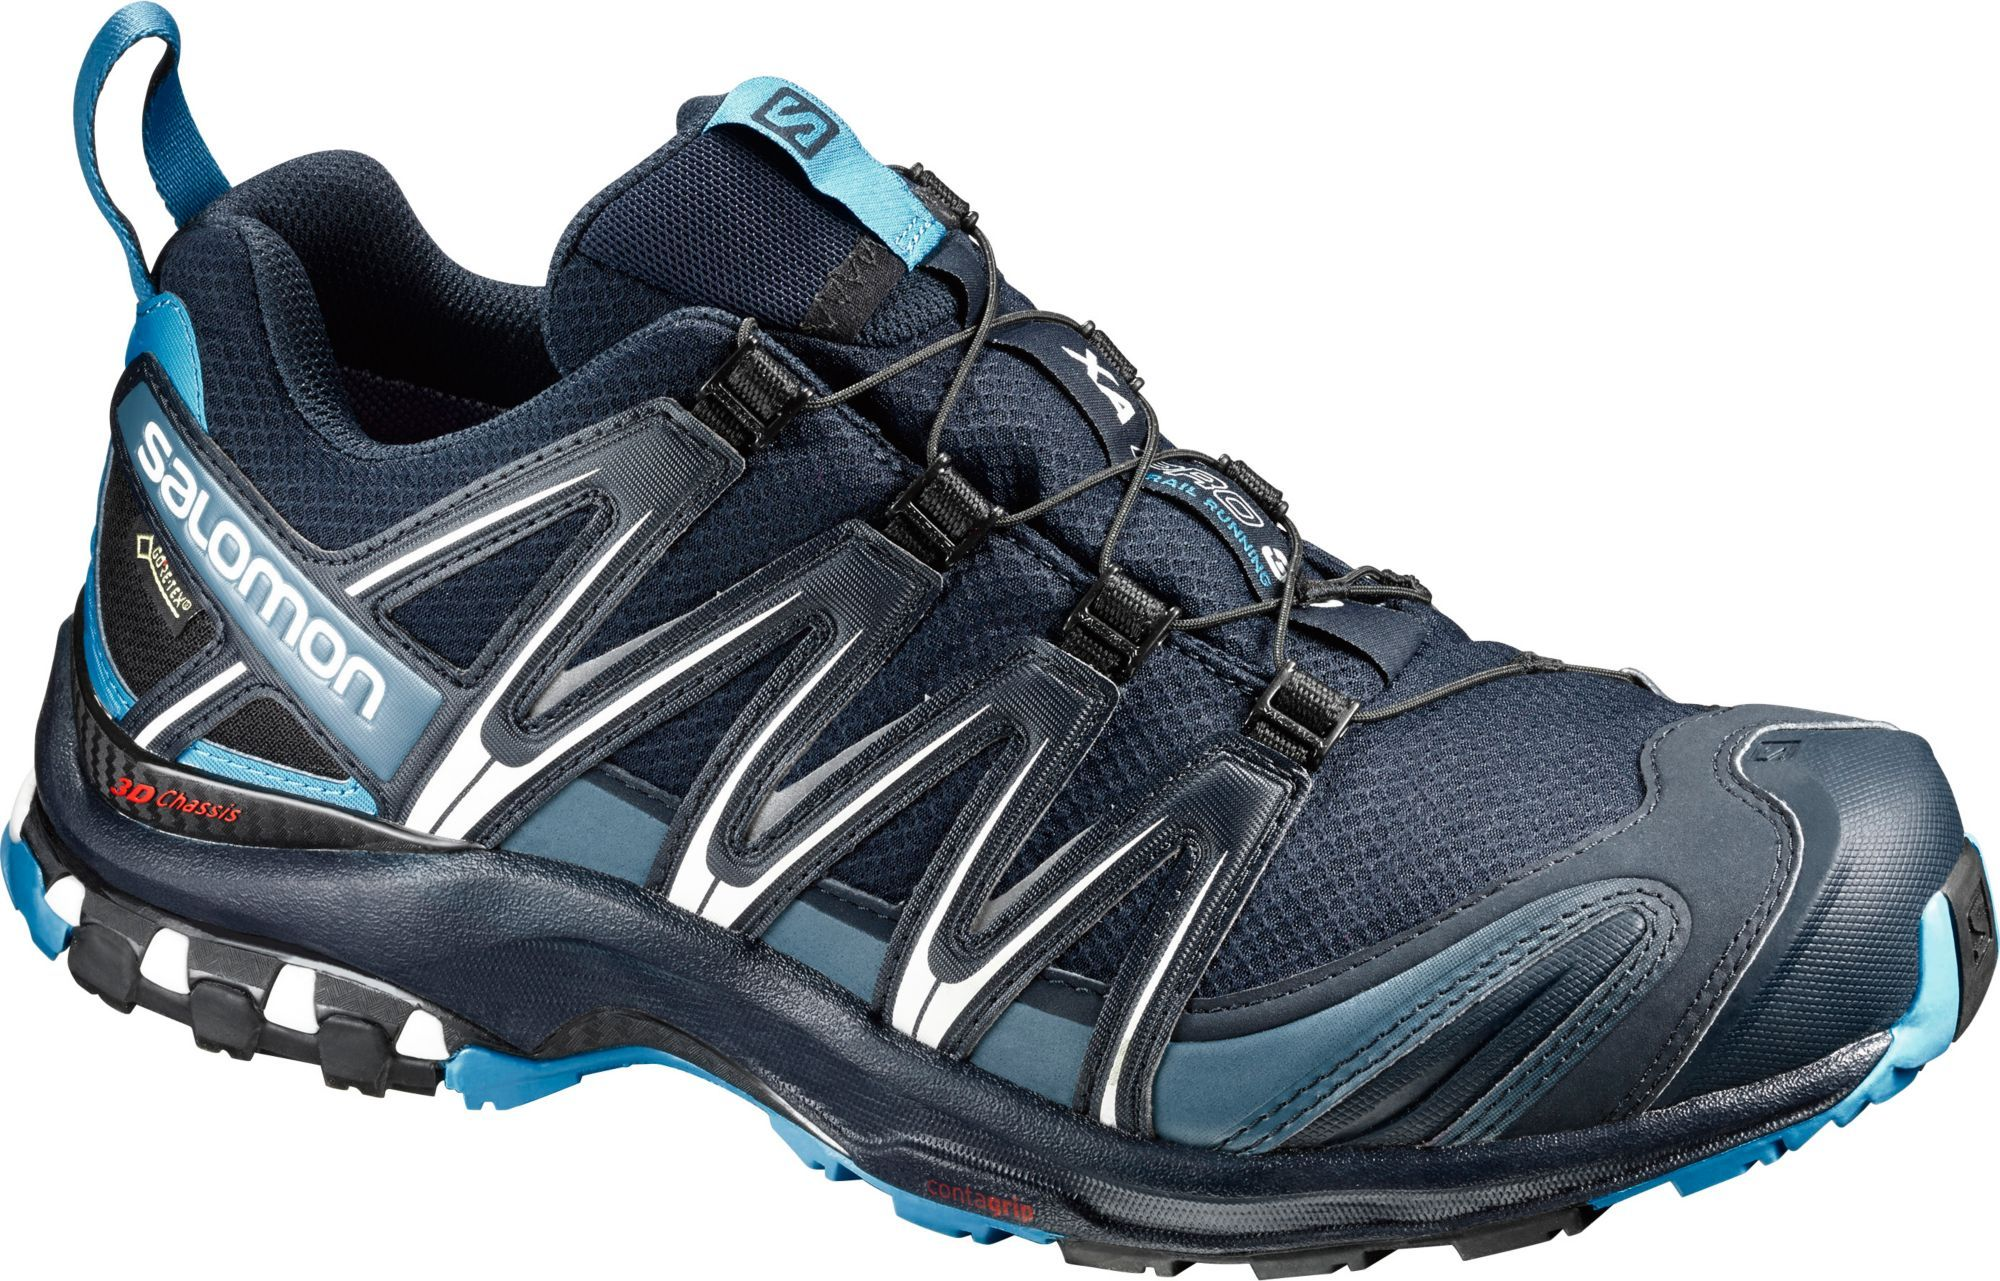 Salomon Men's XA Pro 3D Trail Running Shoes, Size: 9.0, Gray